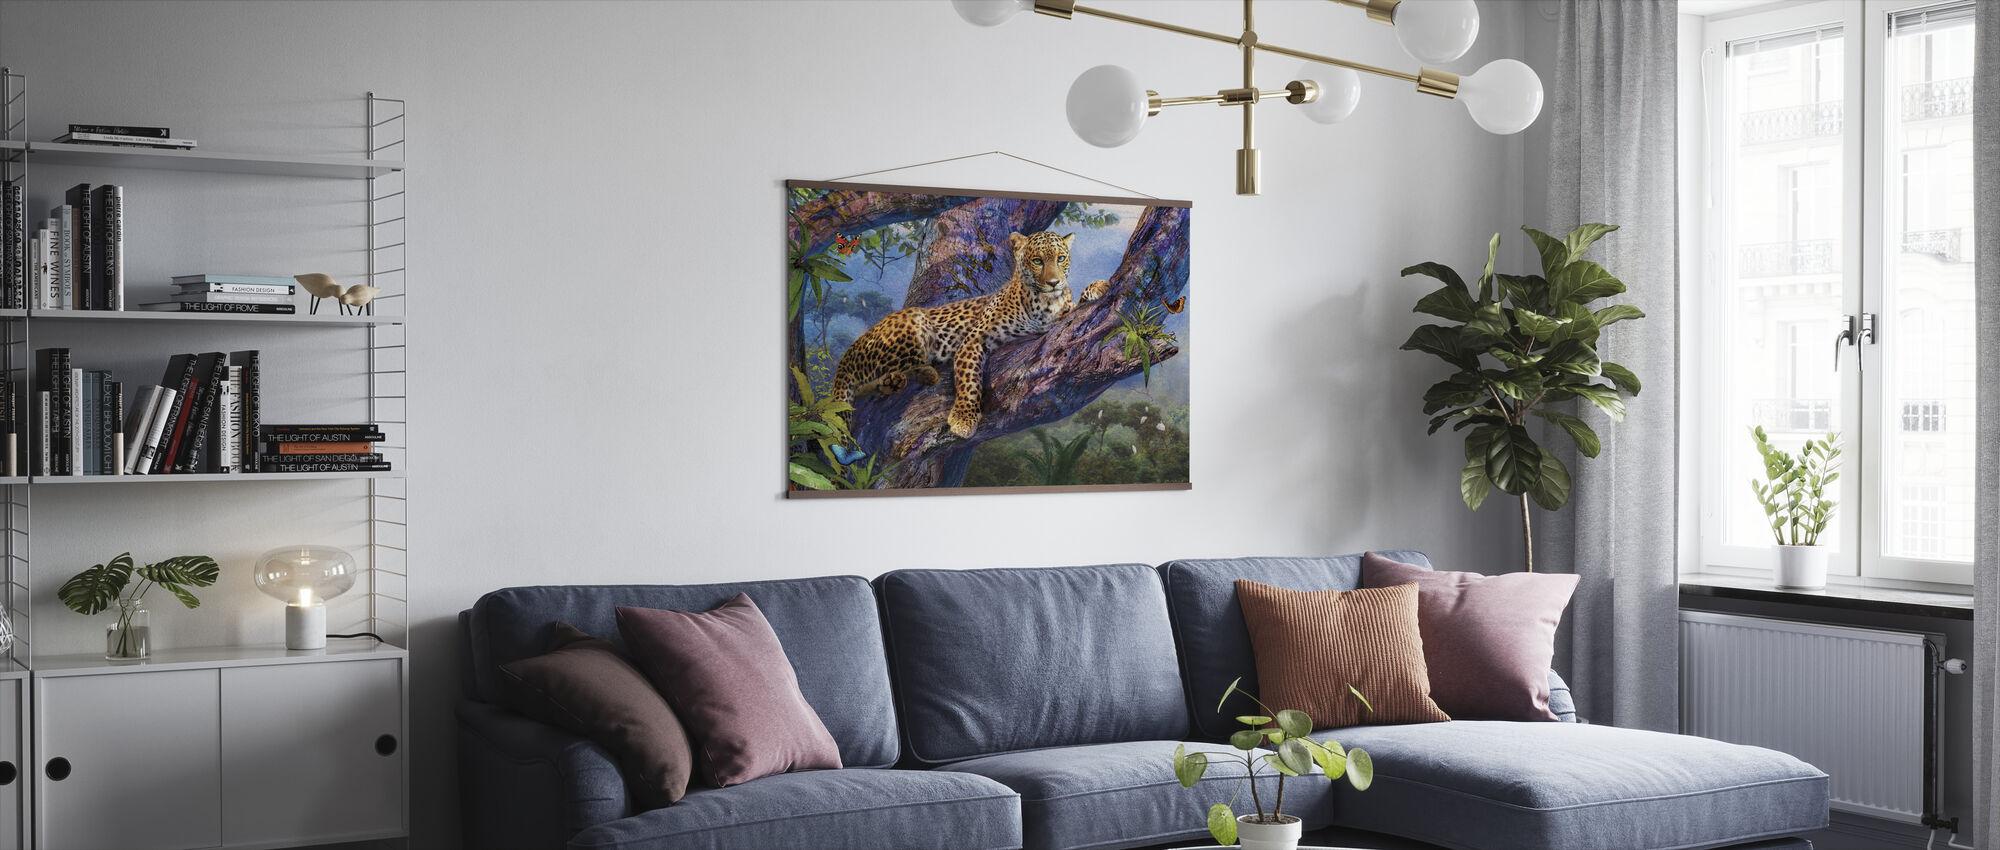 Luipaard Ontspannen in Boom - Poster - Woonkamer